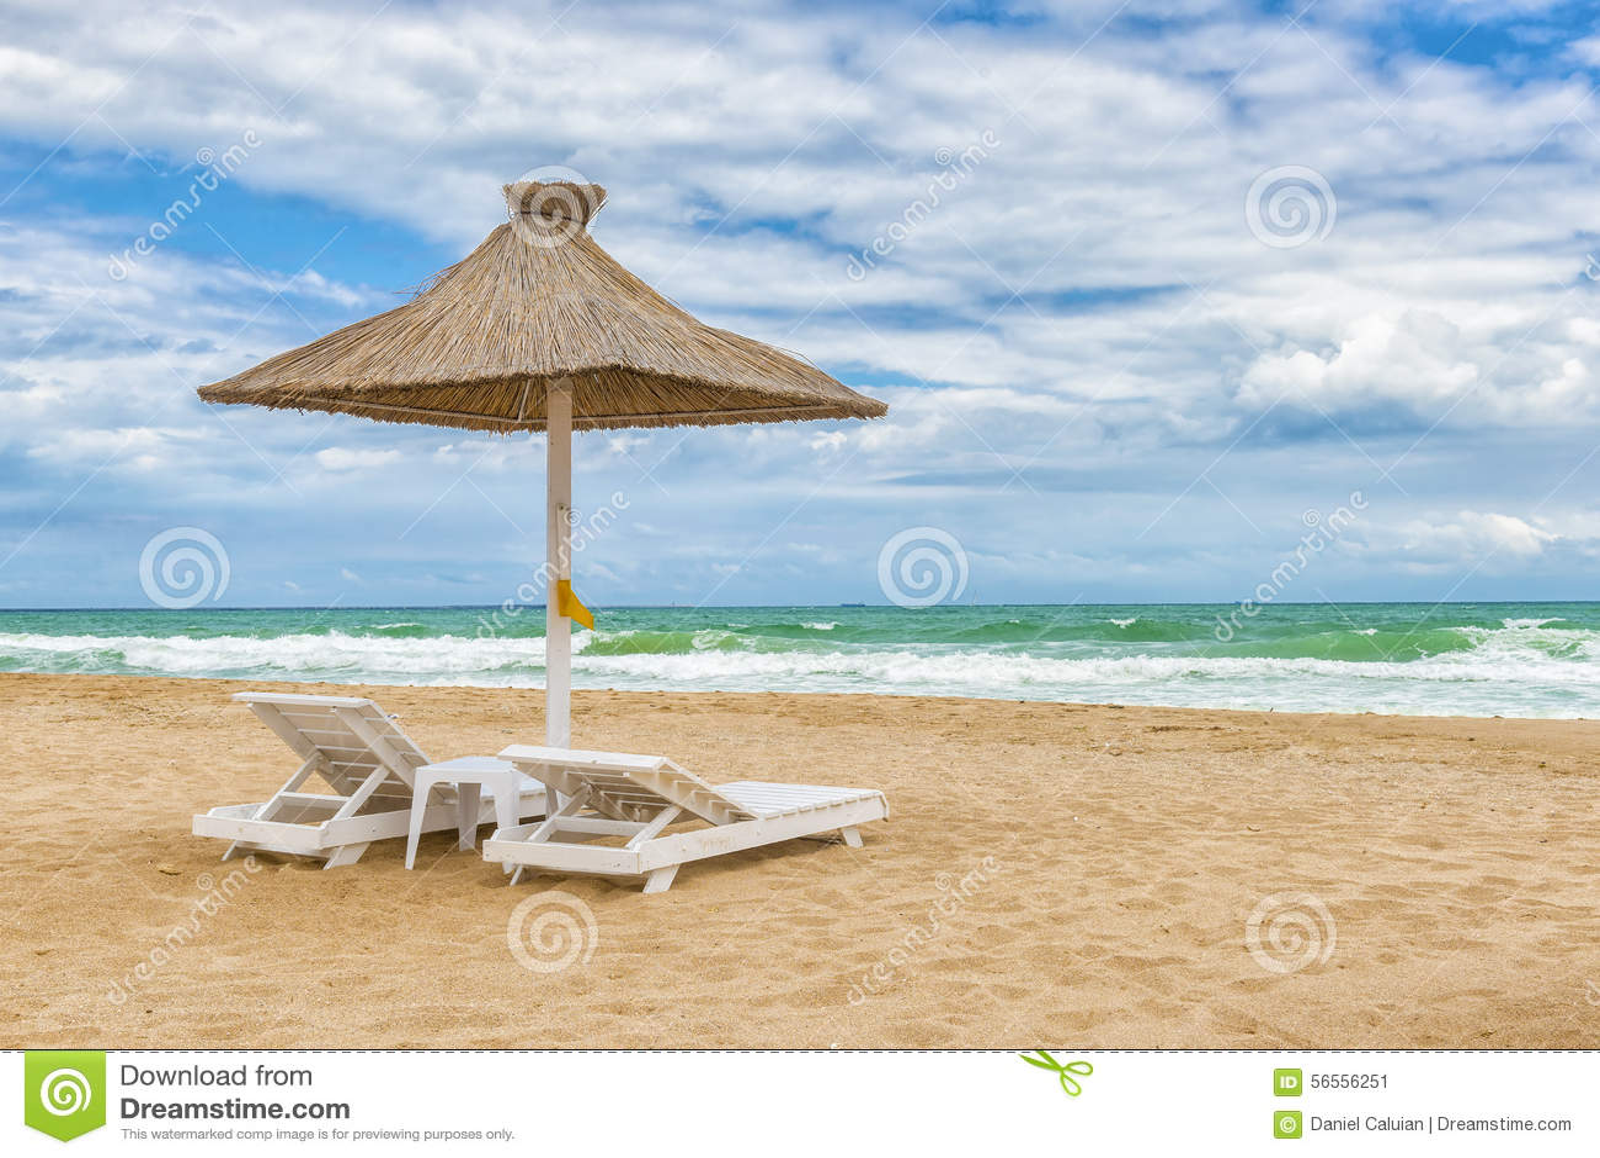 Download Η παραλία Μαύρης Θάλασσας με τις ομπρέλες, λεπτή άμμος, δροσίζει το νερό και το μπλε S Στοκ Εικόνα - εικόνα από χαρά, θέρετρο: 56556251